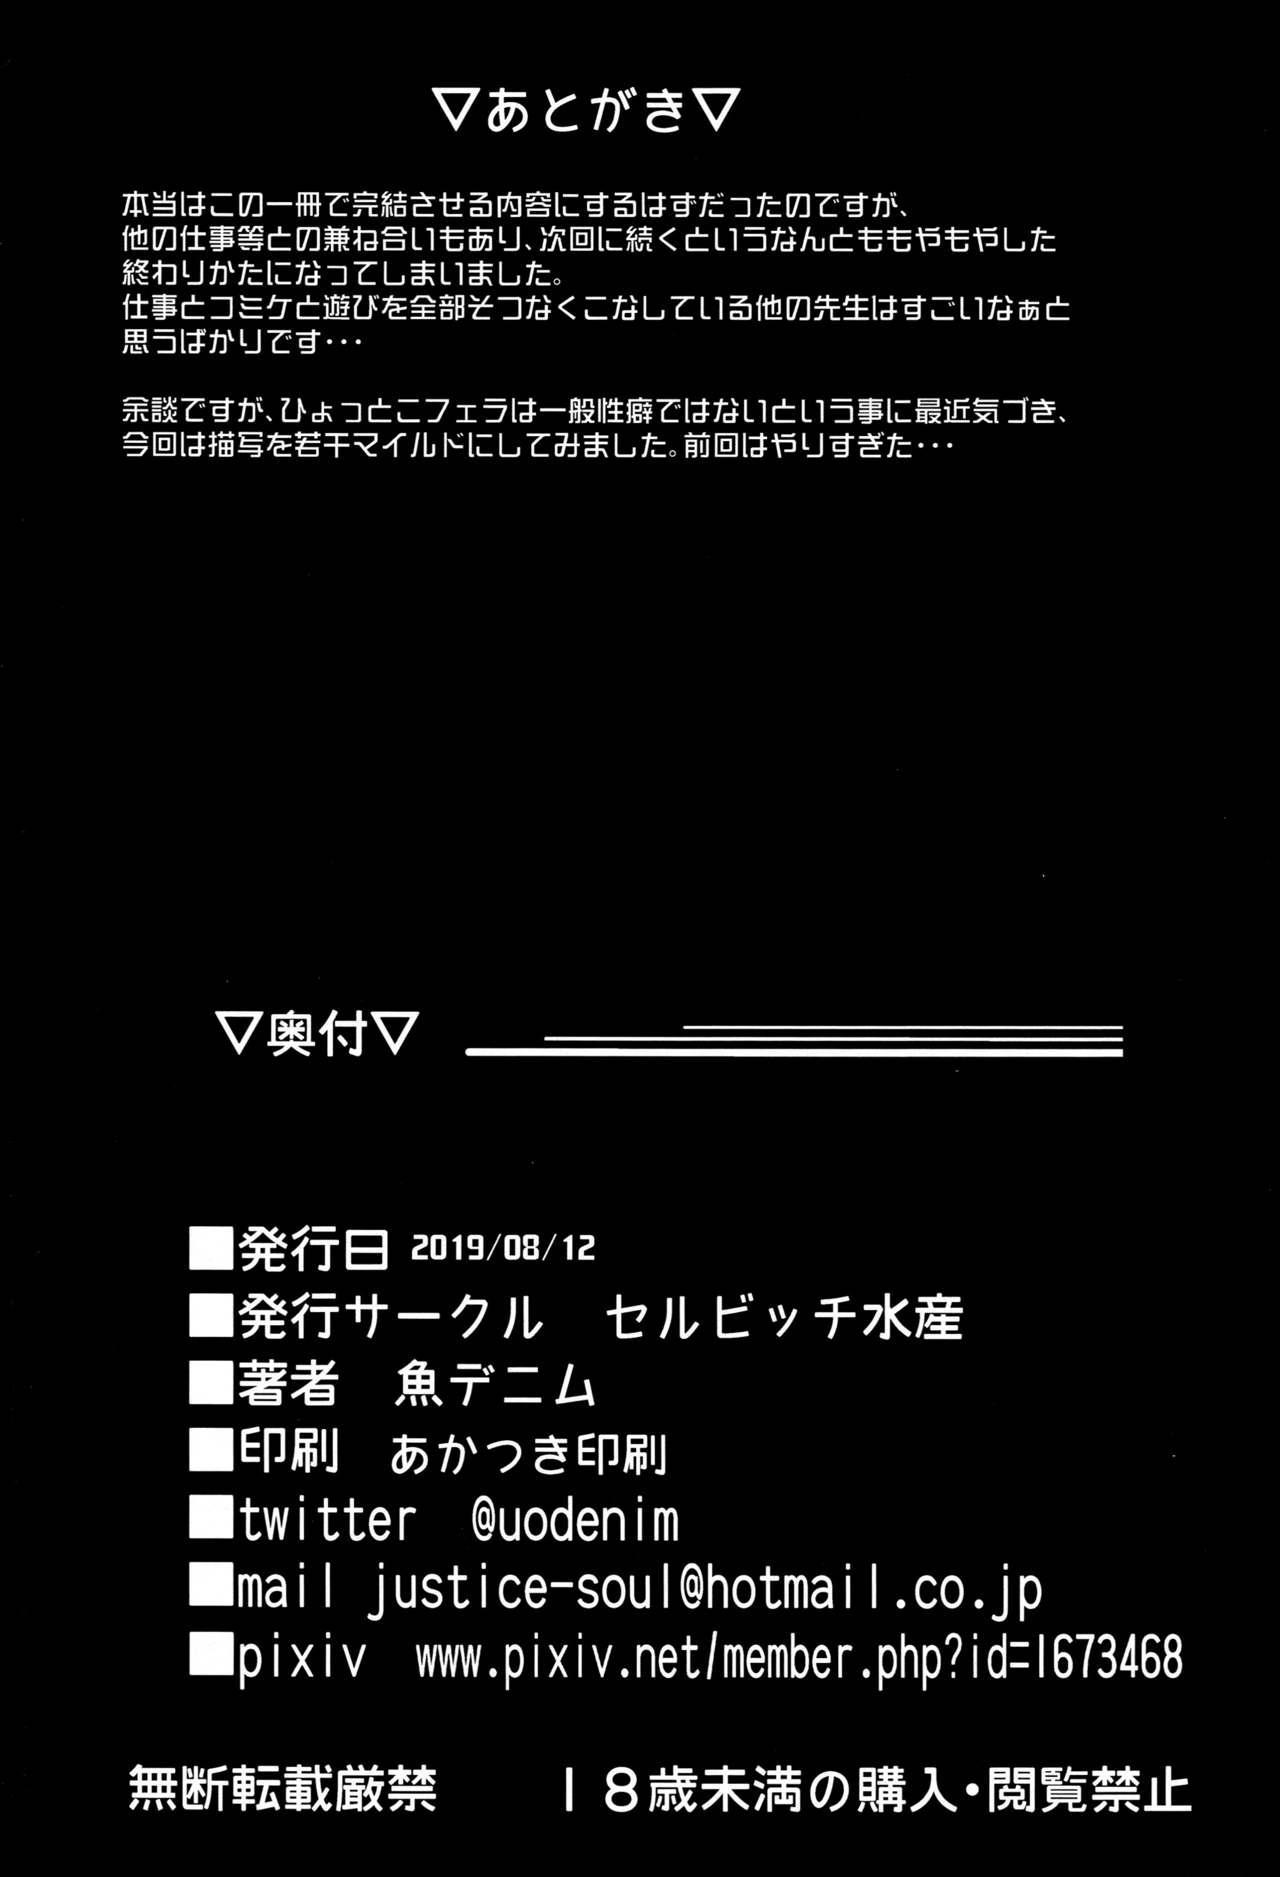 Kagirinaku Toumei ni Chikai B.B - Almost Transparent B,B 21